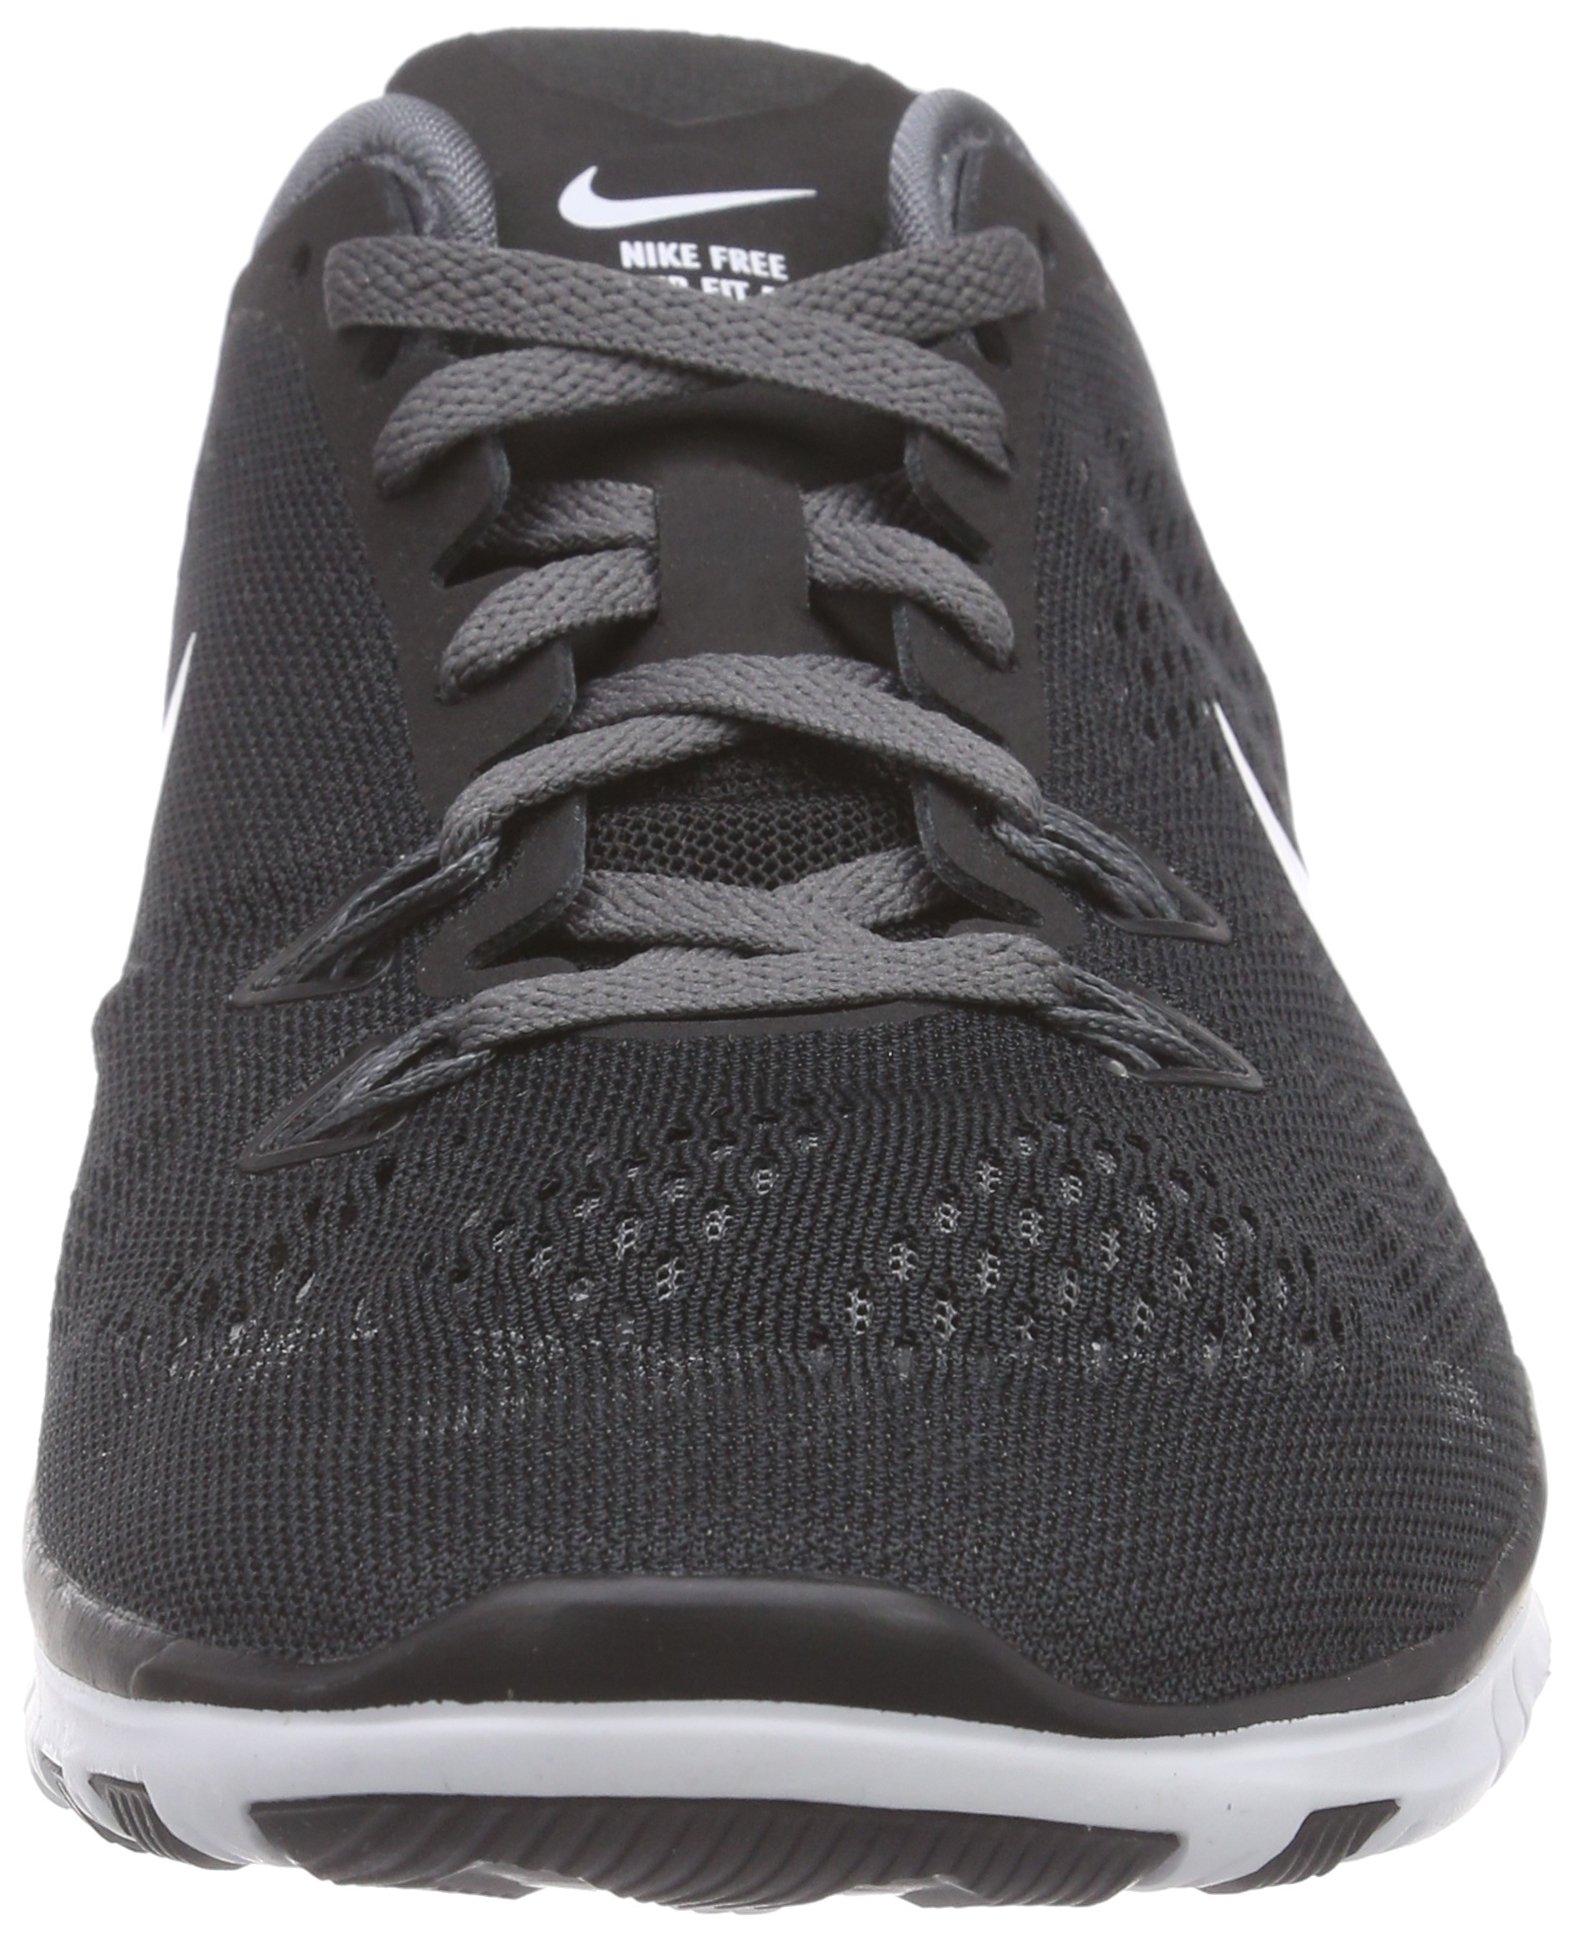 Nike Womens Free 5.0 Tr Fit 5 Black/White/Dark Grey/White Training Shoe 5 Women US by Nike (Image #4)